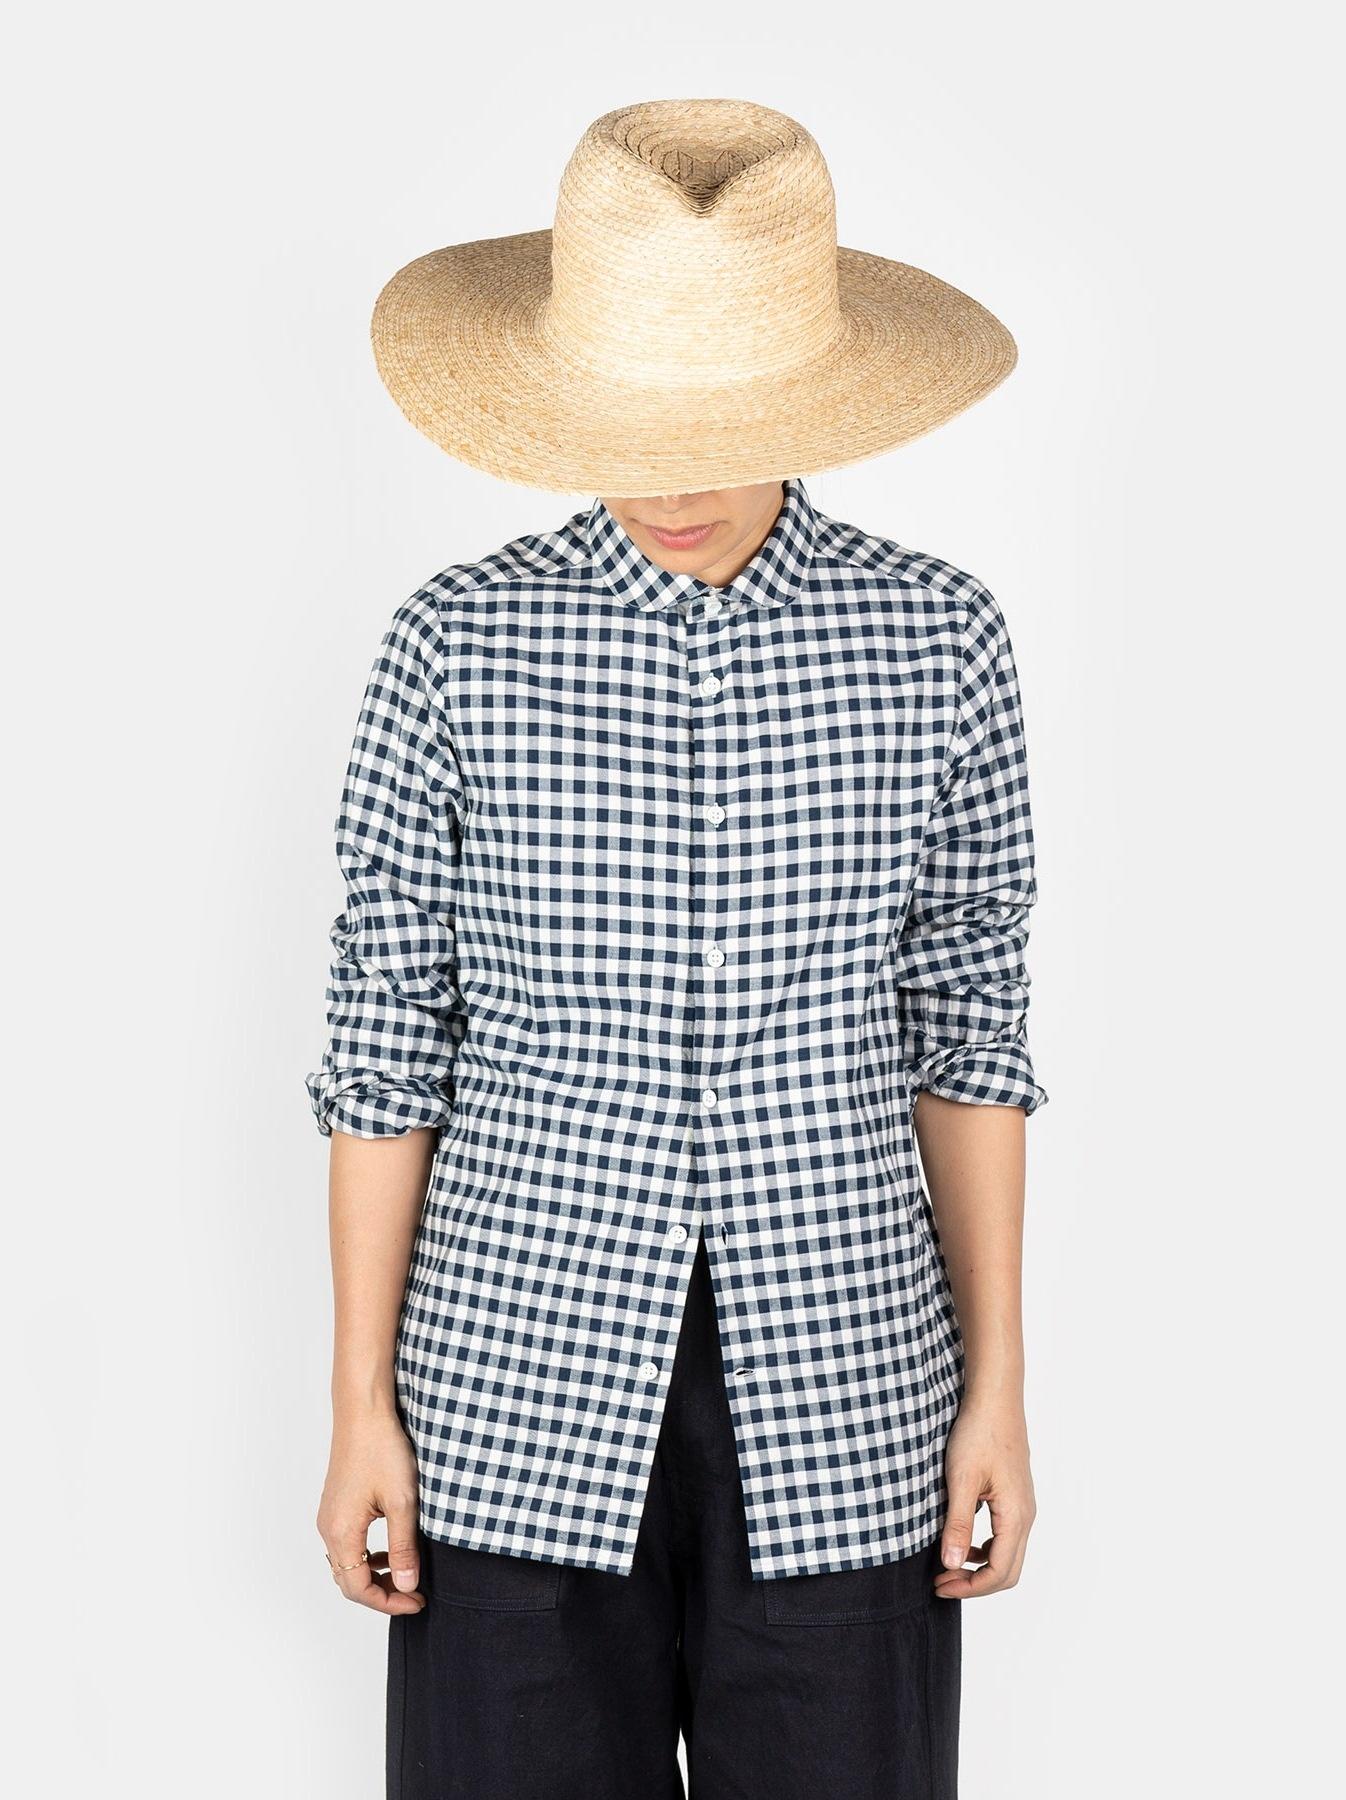 WH Indigo Oxford 908 Round Collar Shirt-5